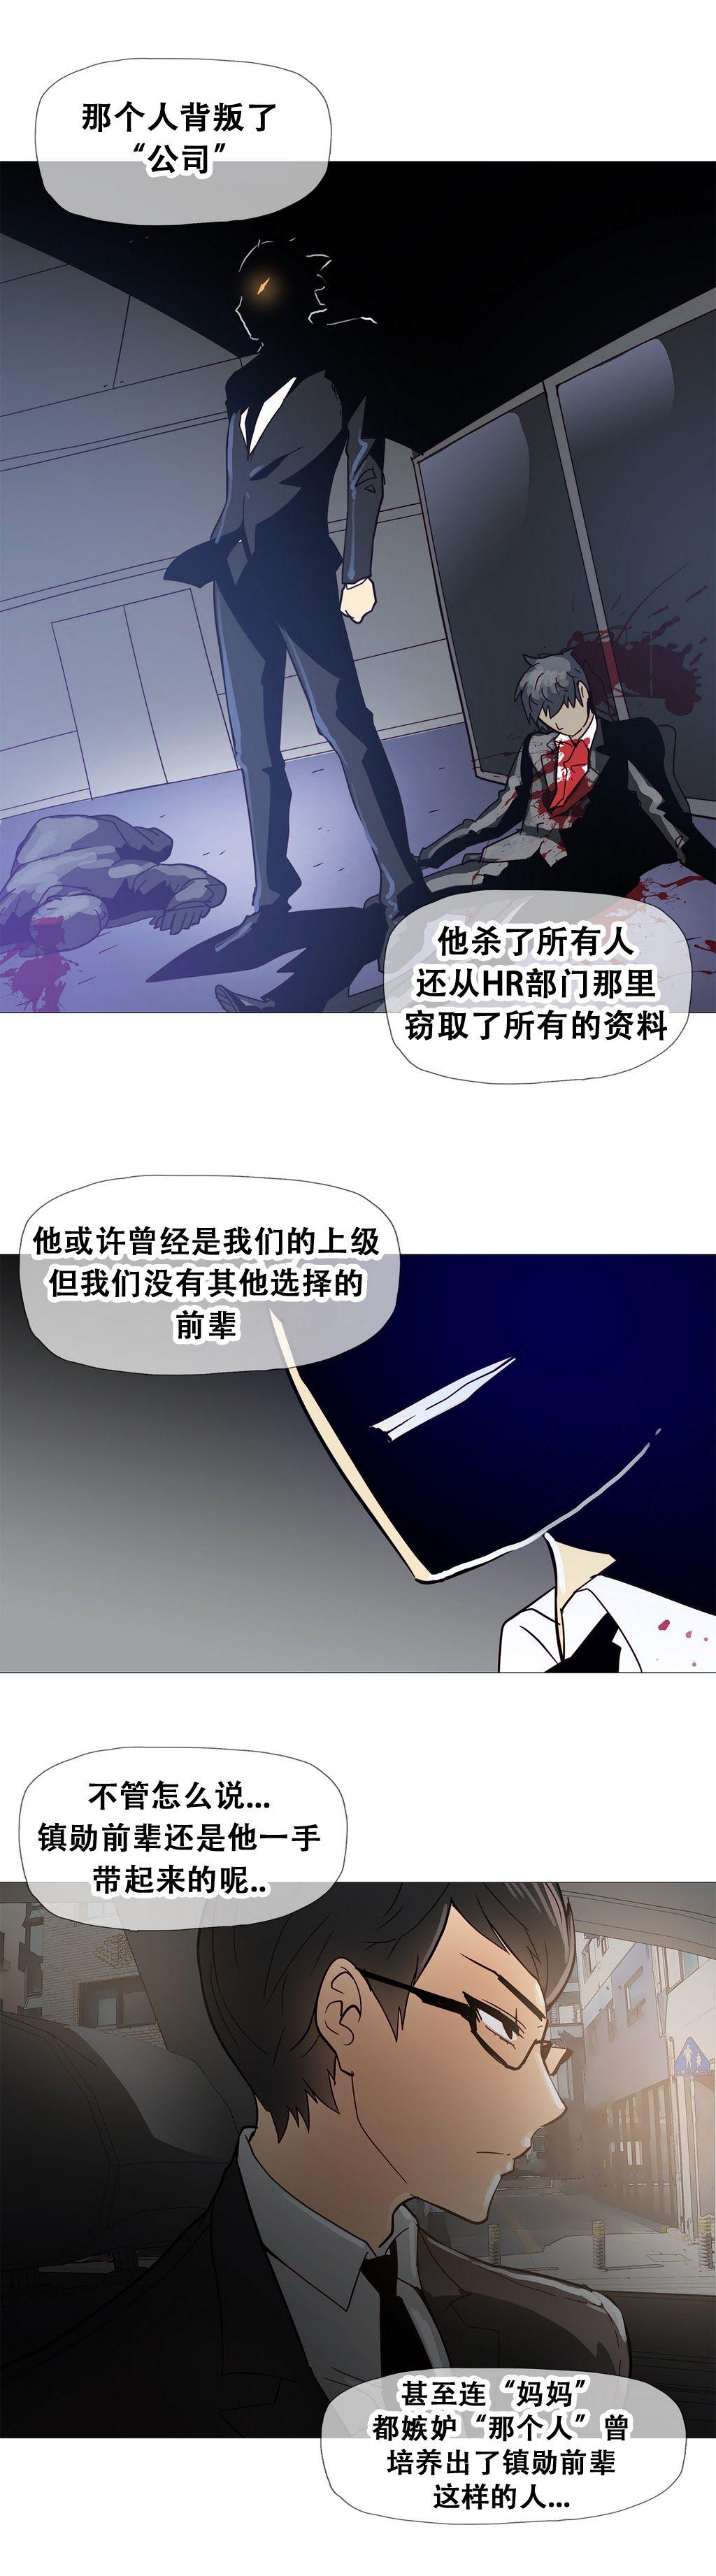 HouseHold Affairs 【卞赤鲤个人汉化】1~21话(持续更新中) 299